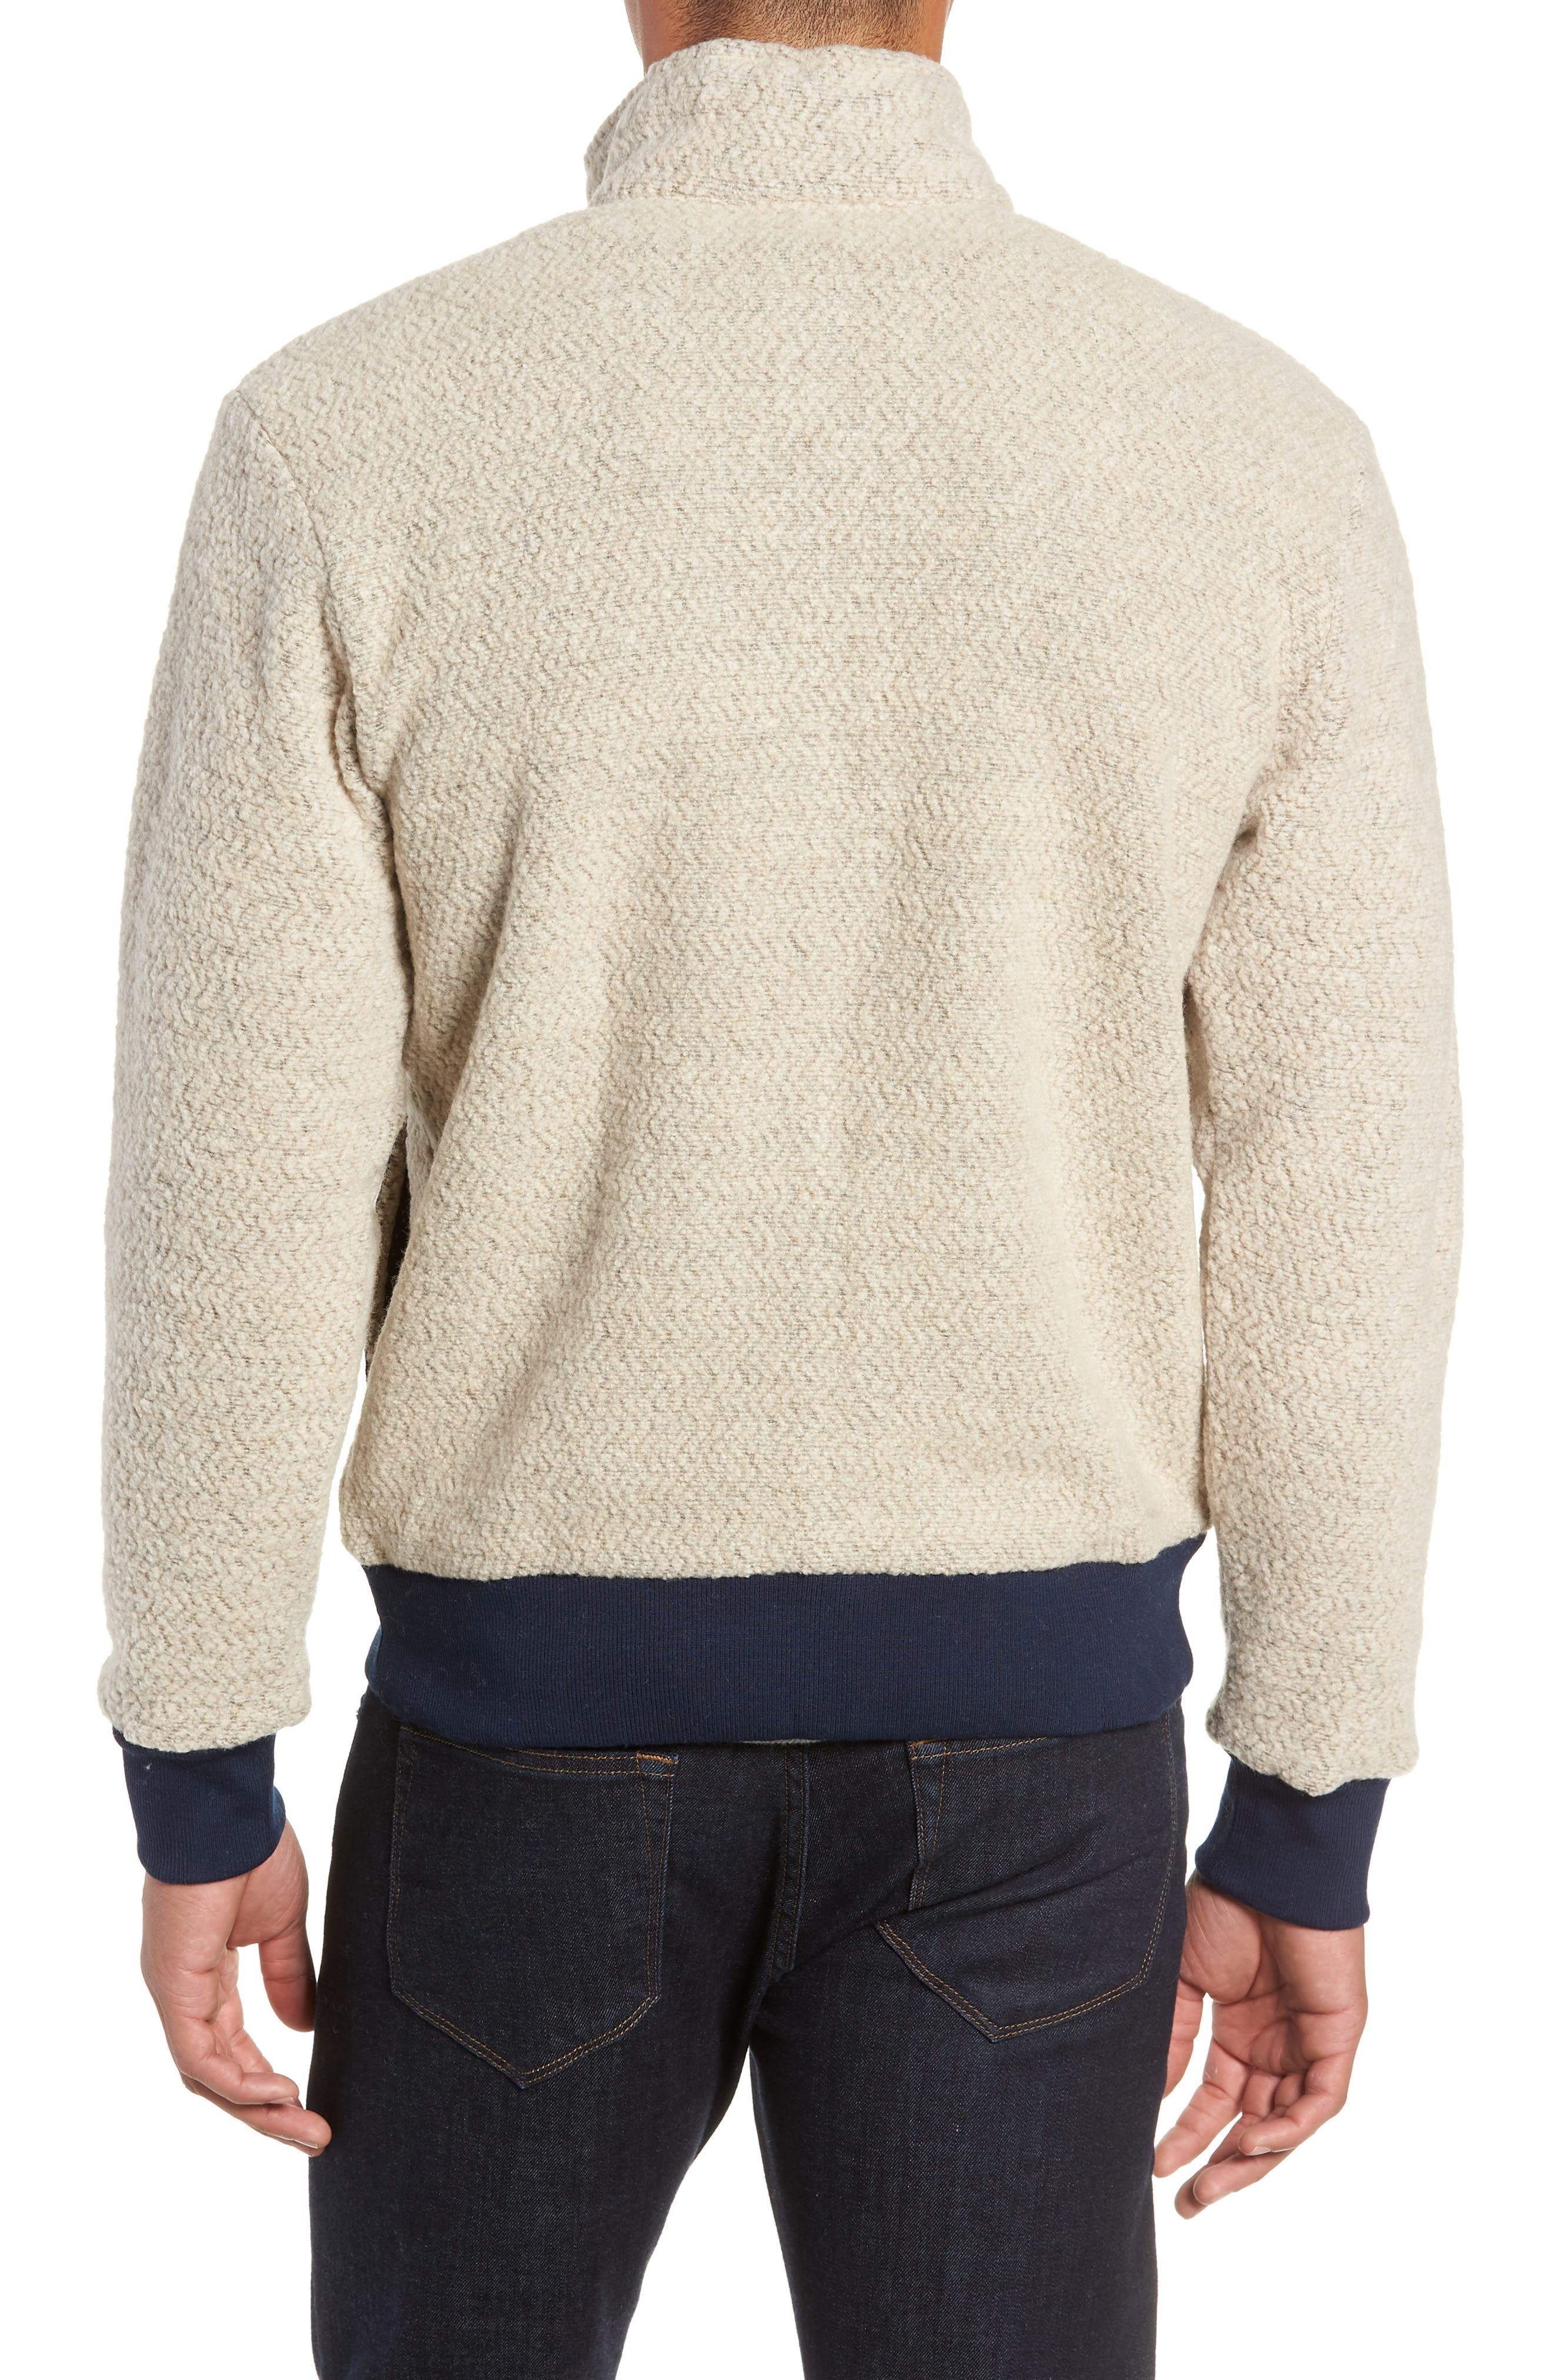 Woolyester Fleece Jacket,                             Alternate thumbnail 2, color,                             OATMEAL HEATHER